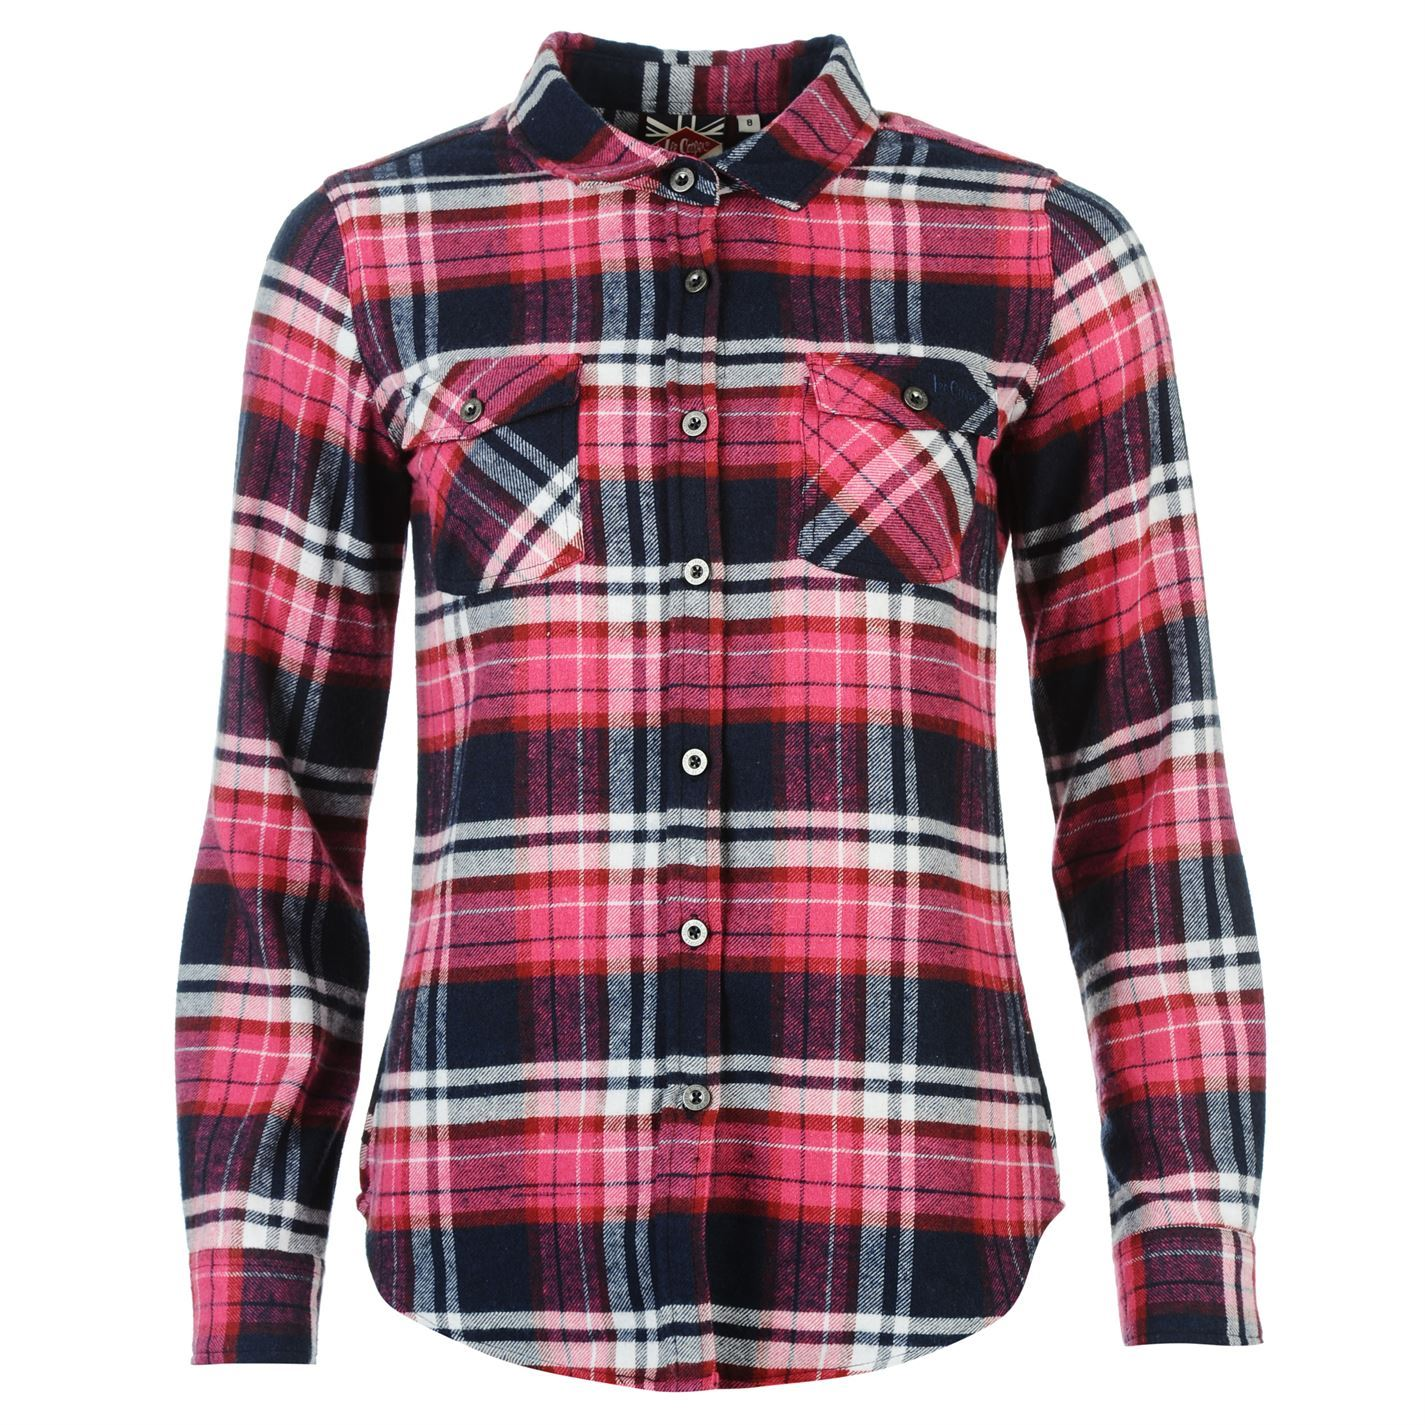 Womens Flannel Shirt - Fashionable / Red / Black / Rectangular Pattern